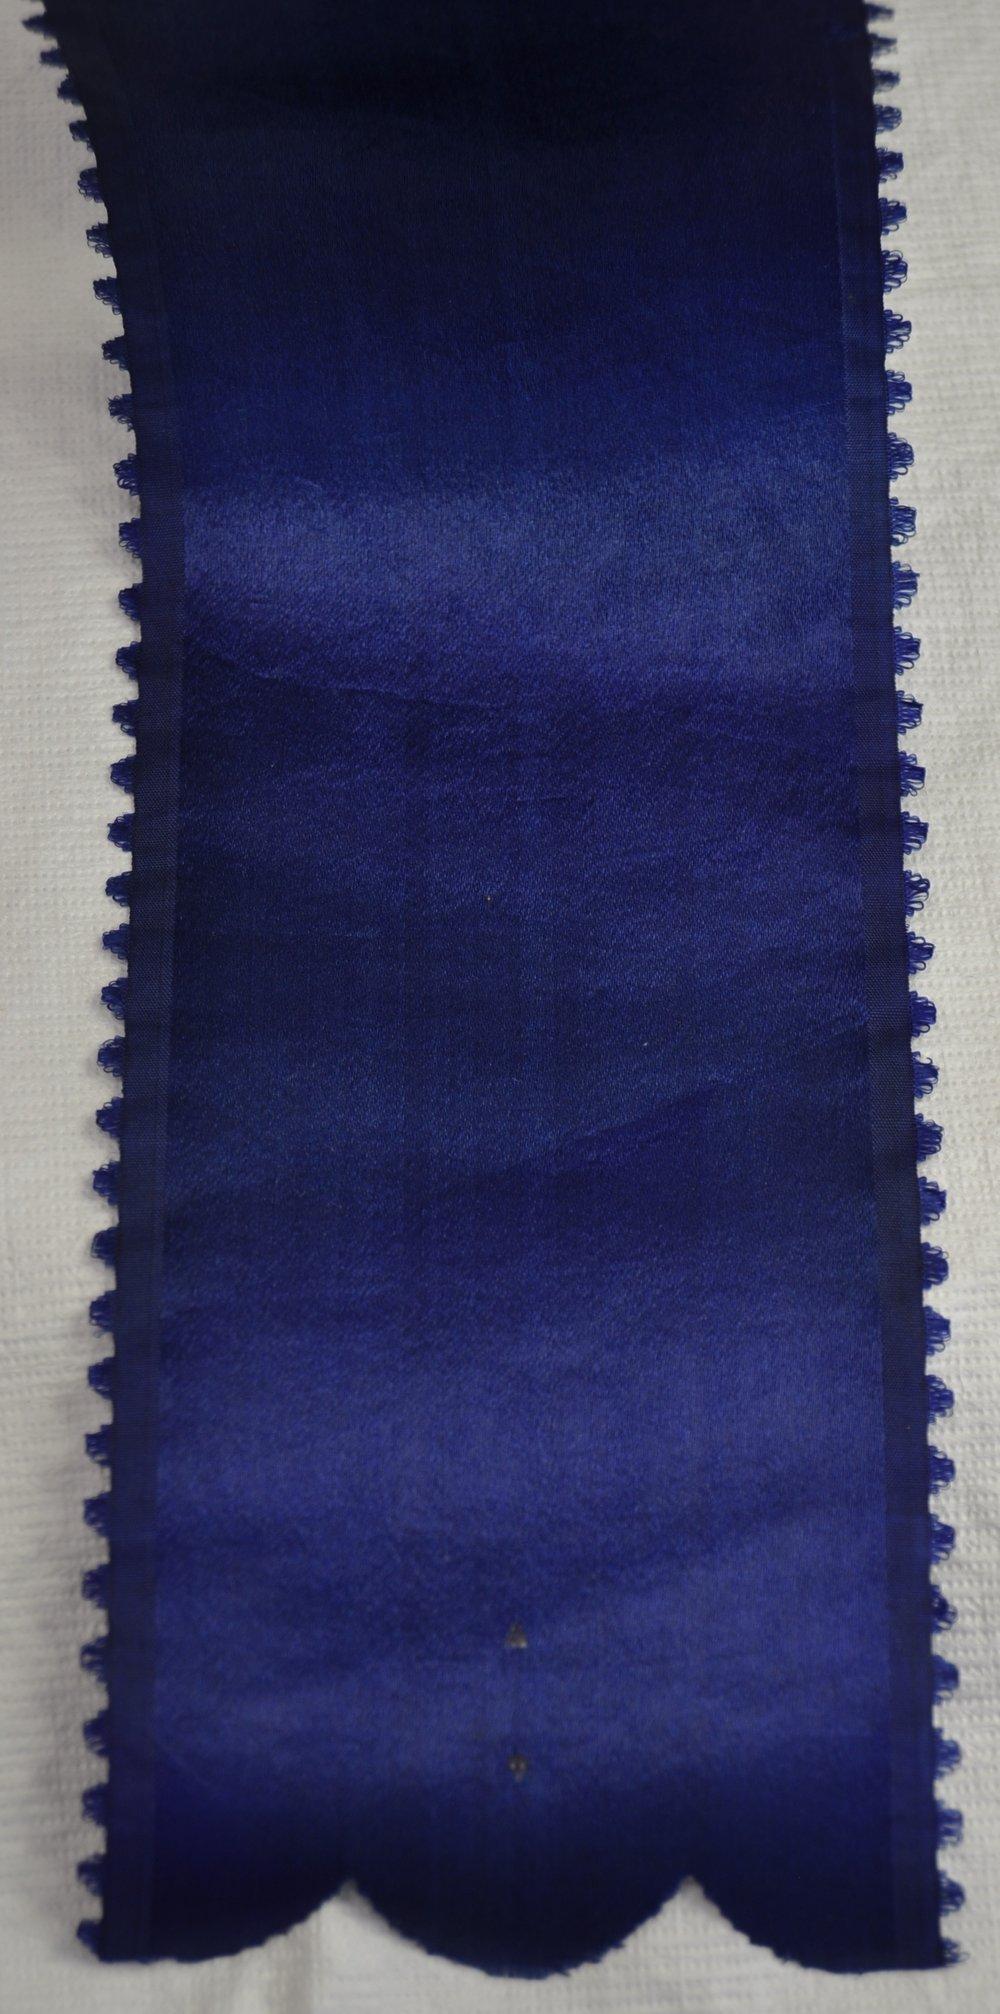 Ribbon detail, after conservation